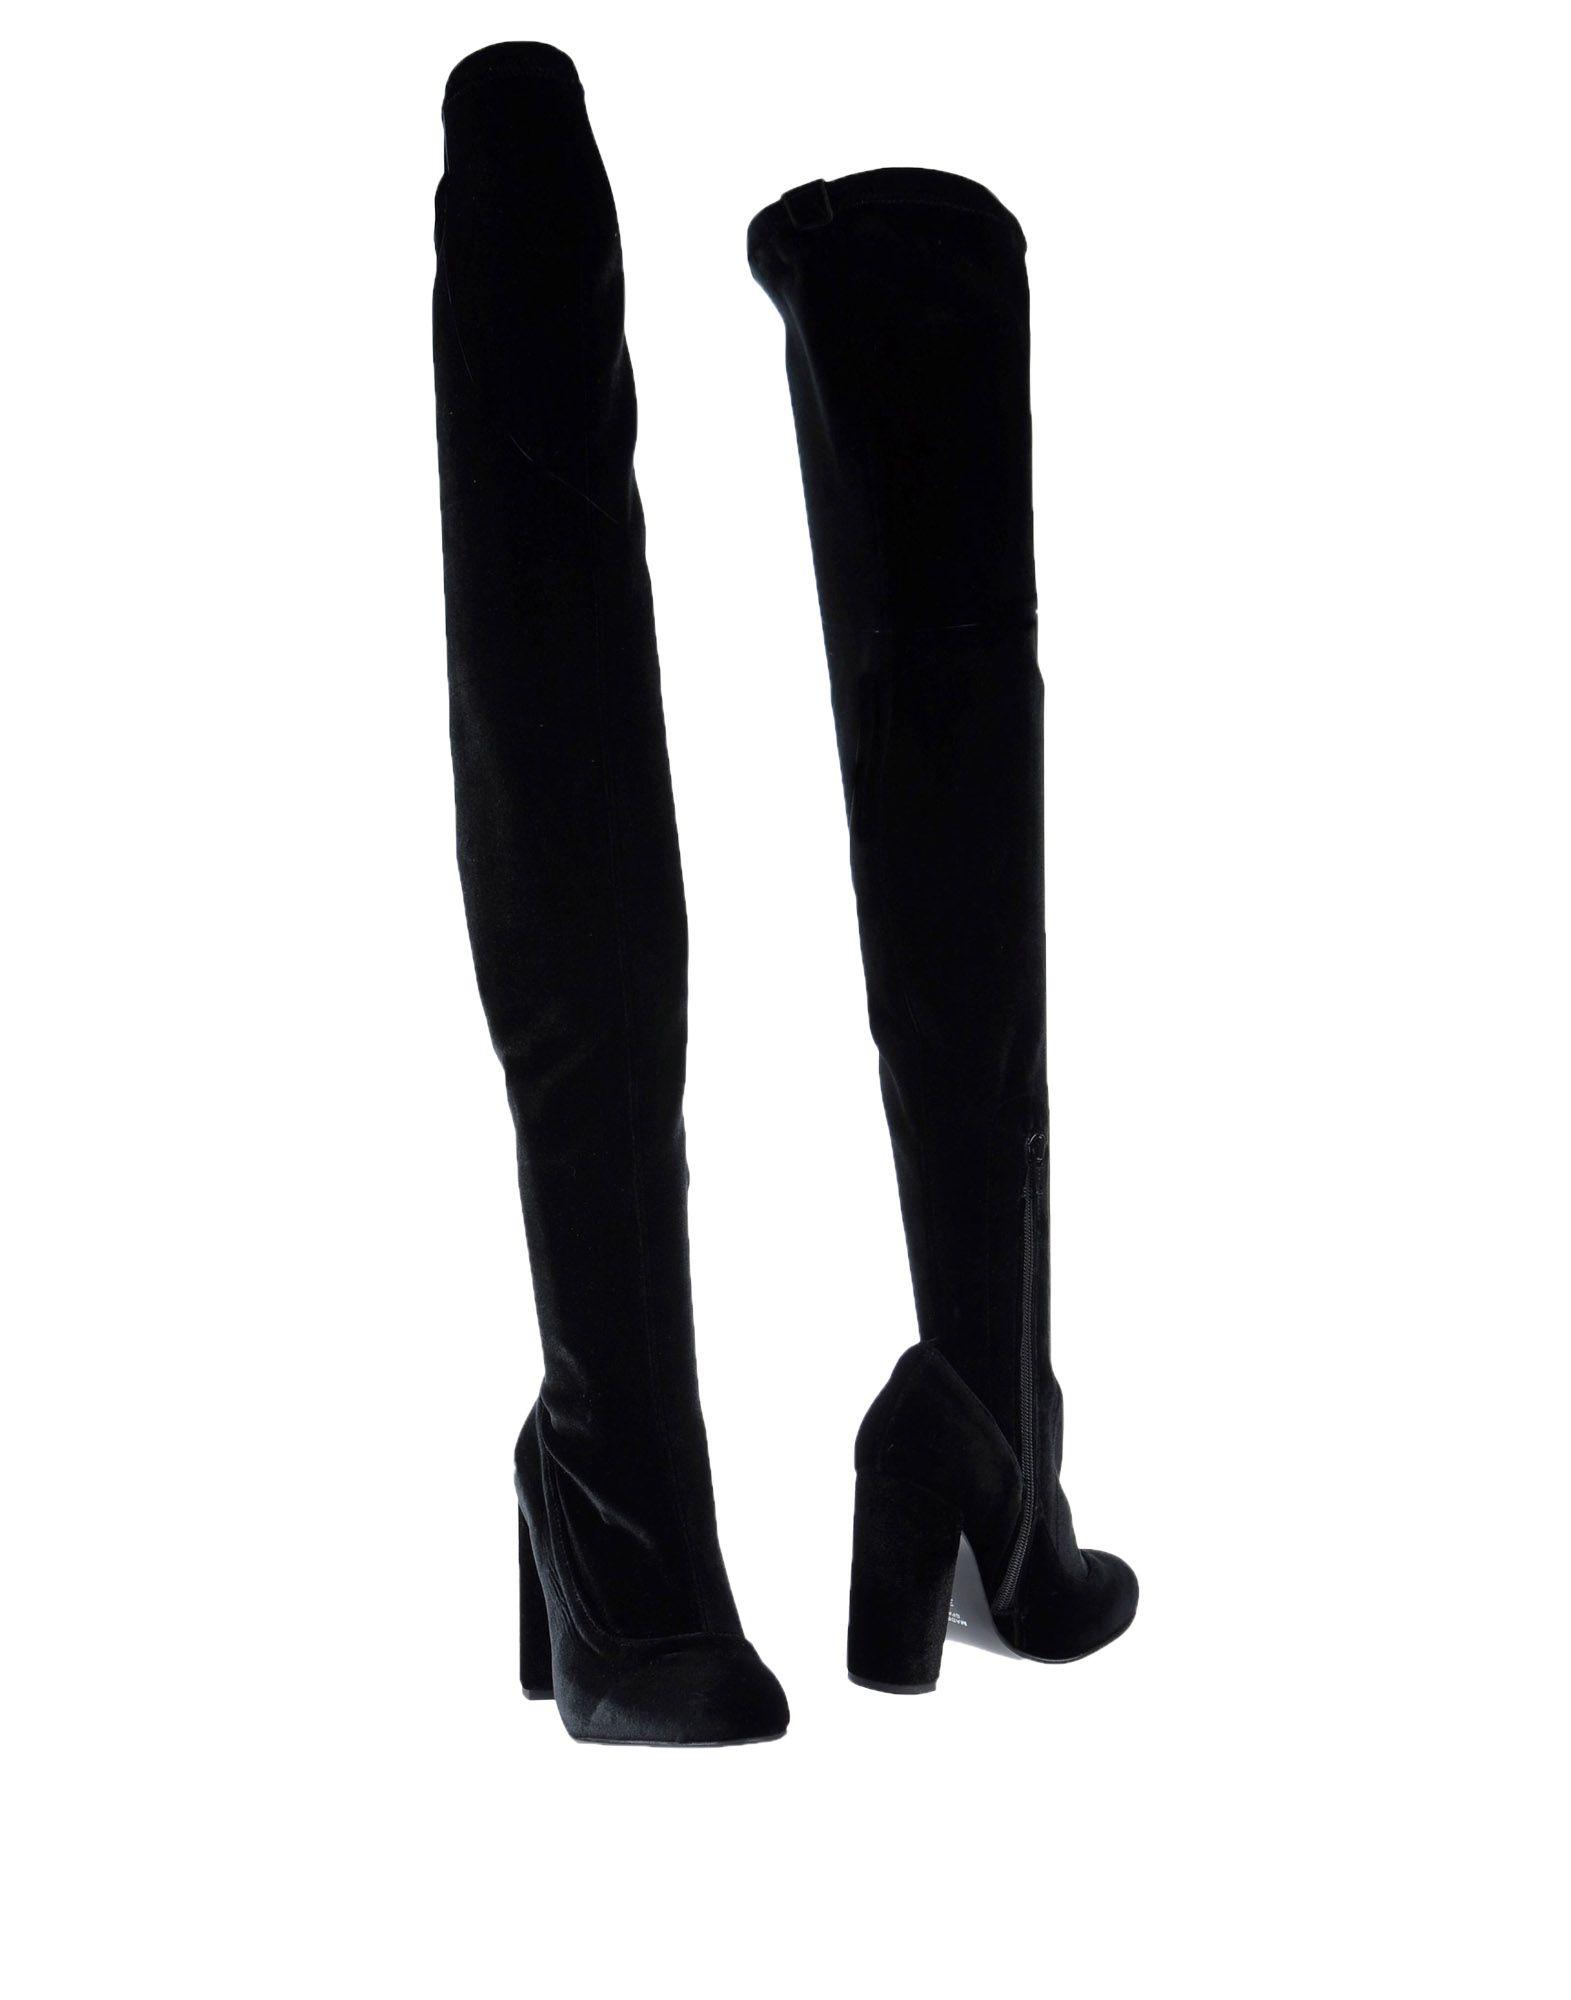 Stilvolle billige Schuhe Damen Cross Walk Stiefel Damen Schuhe  11147453ED 43f1d8